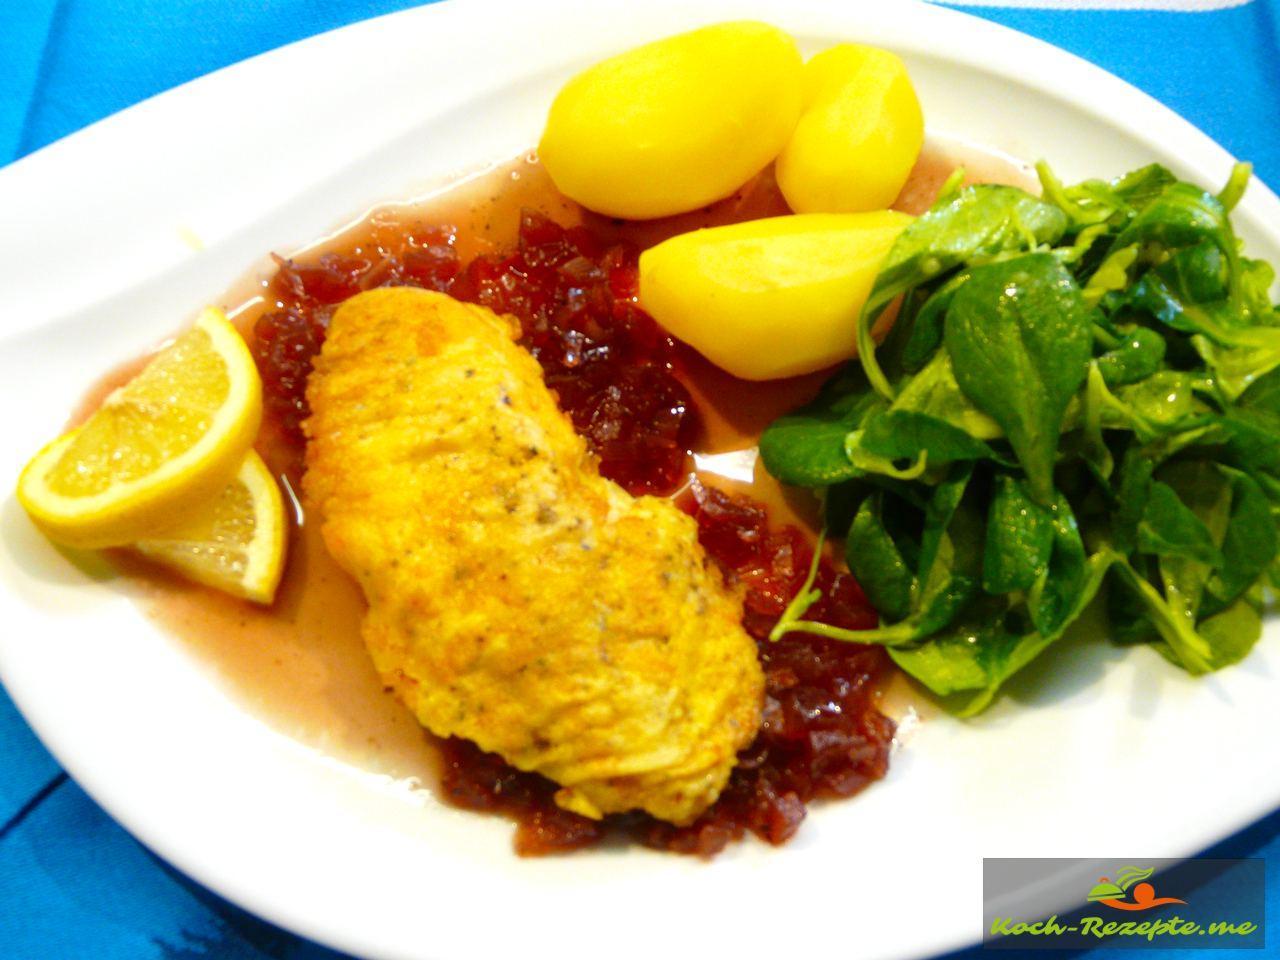 Leckeres Zwiebel-Kompott rot, Rotbarschfilet in Eihülle auf Zwiebel-Kompott